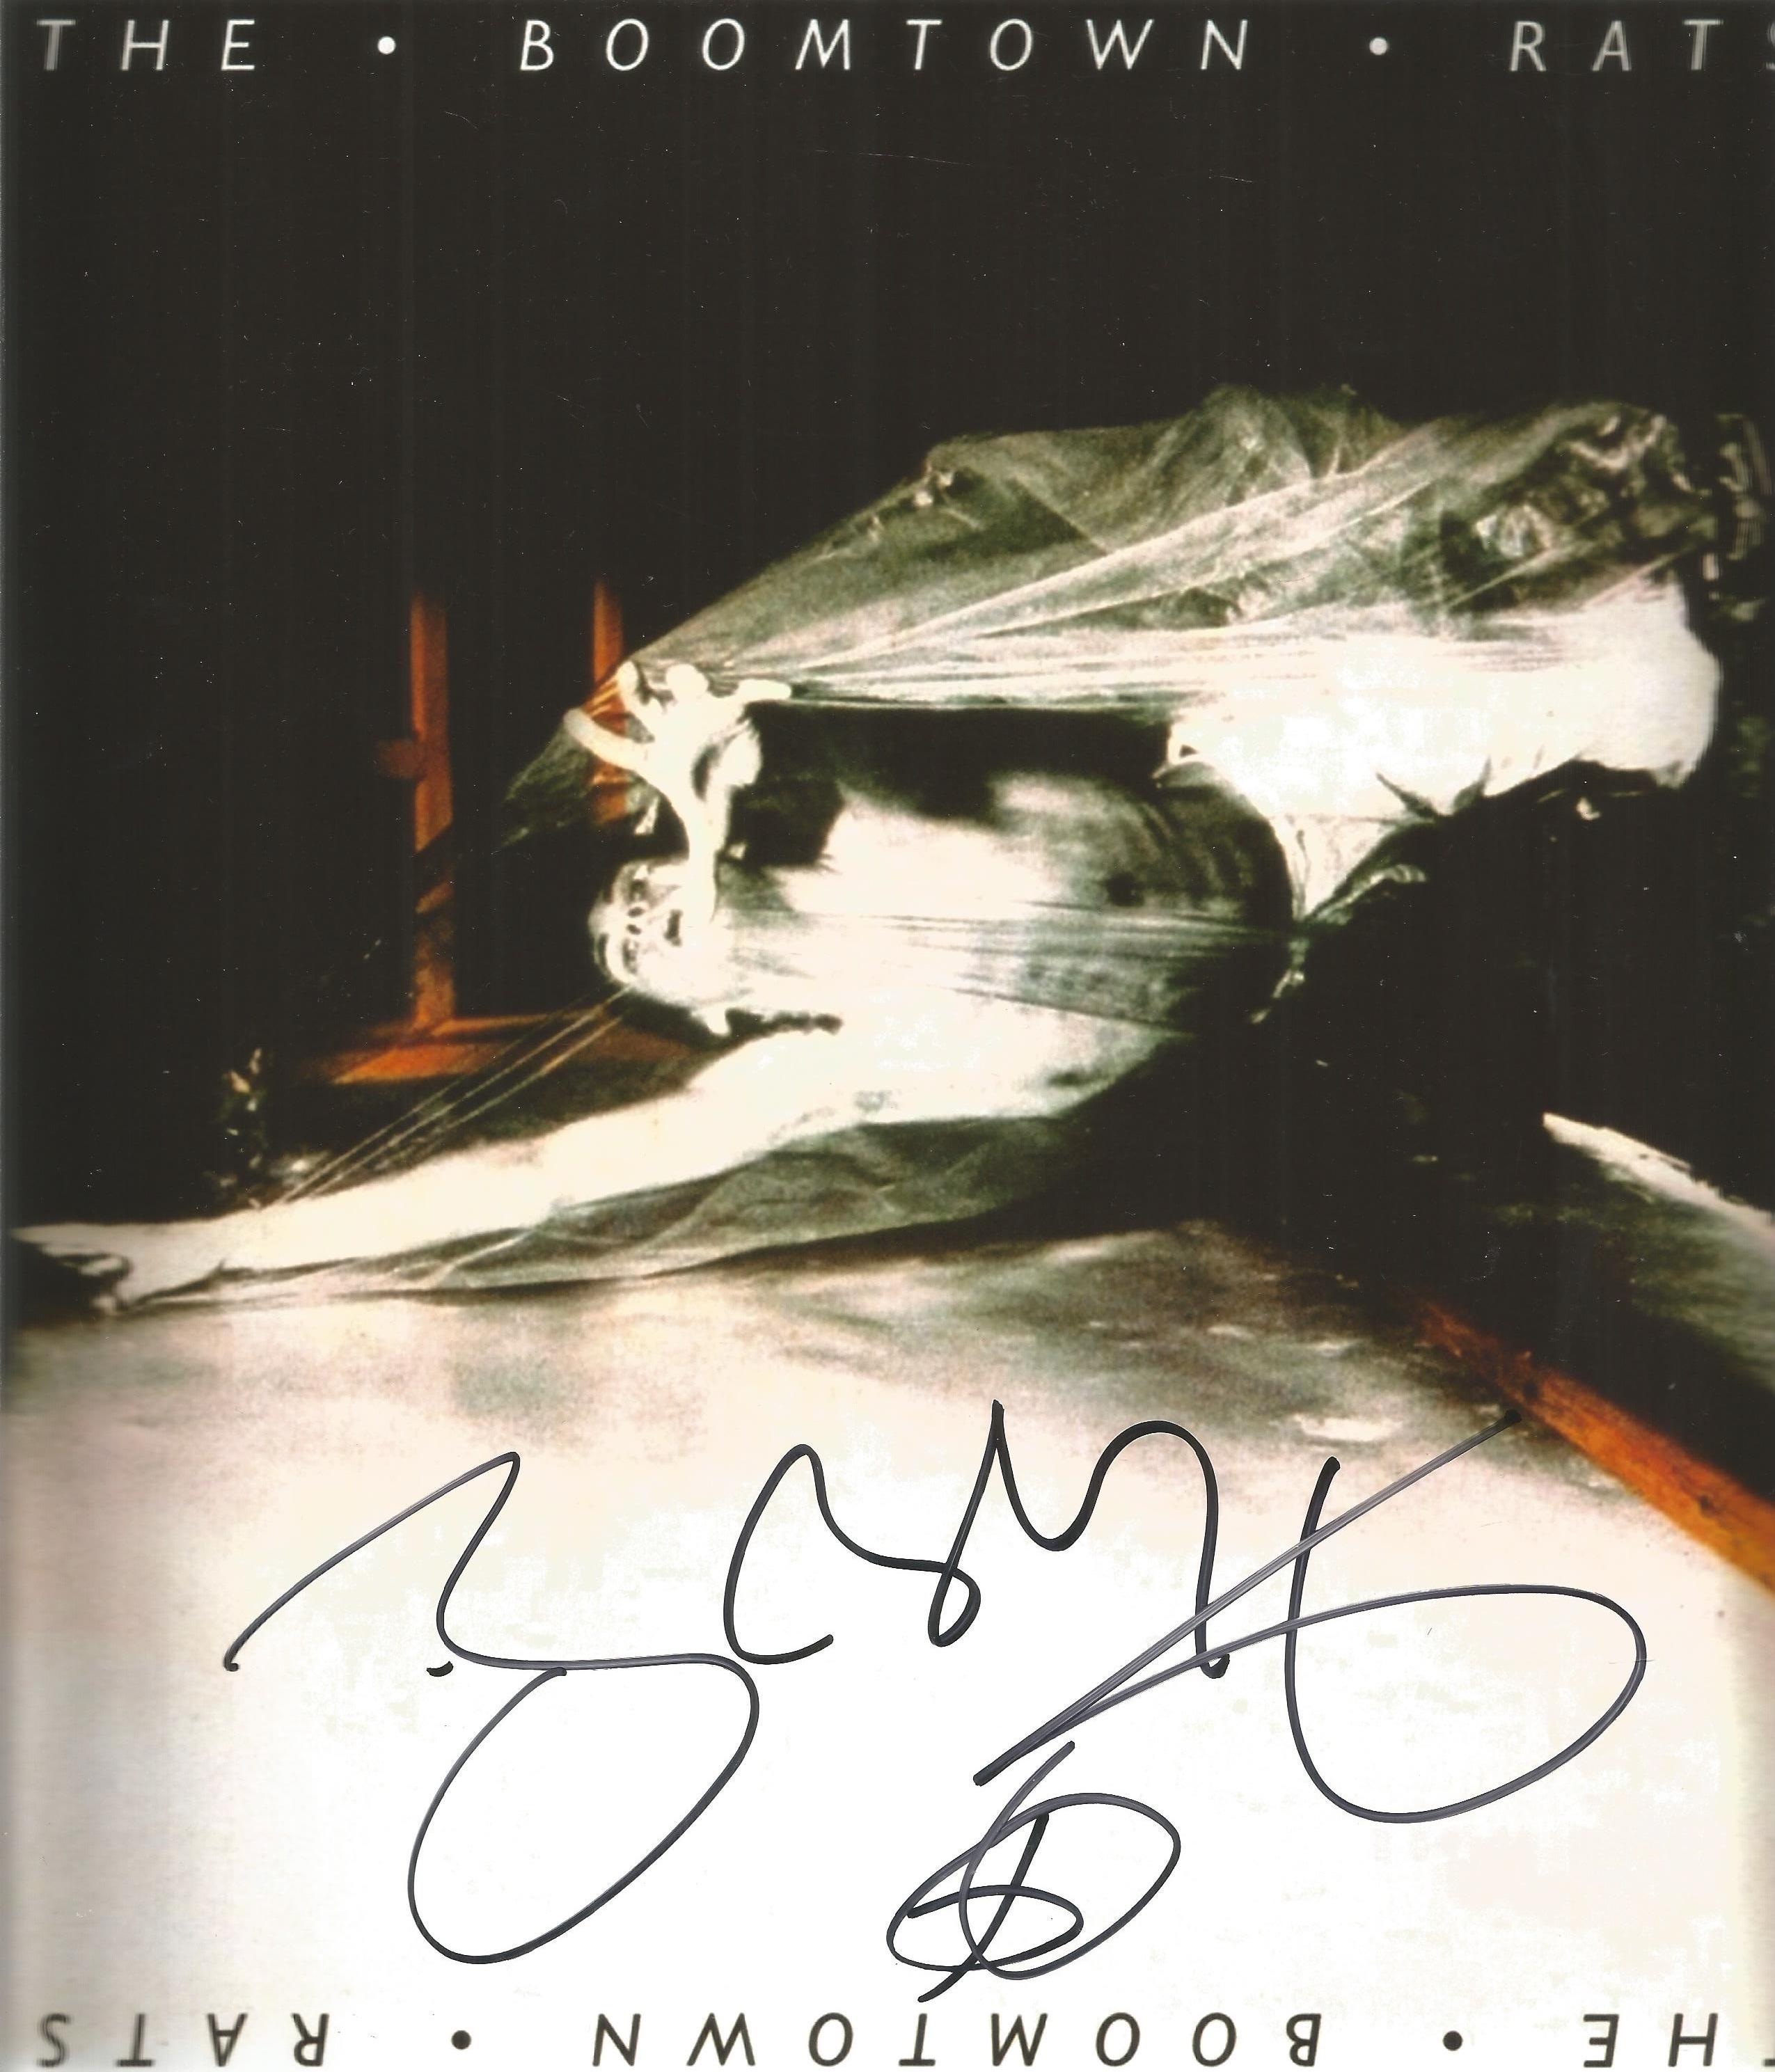 Bob Geldof signed 10x10 Boomtown Rats colour promo photo. Robert Frederick Zenon Geldof born 5